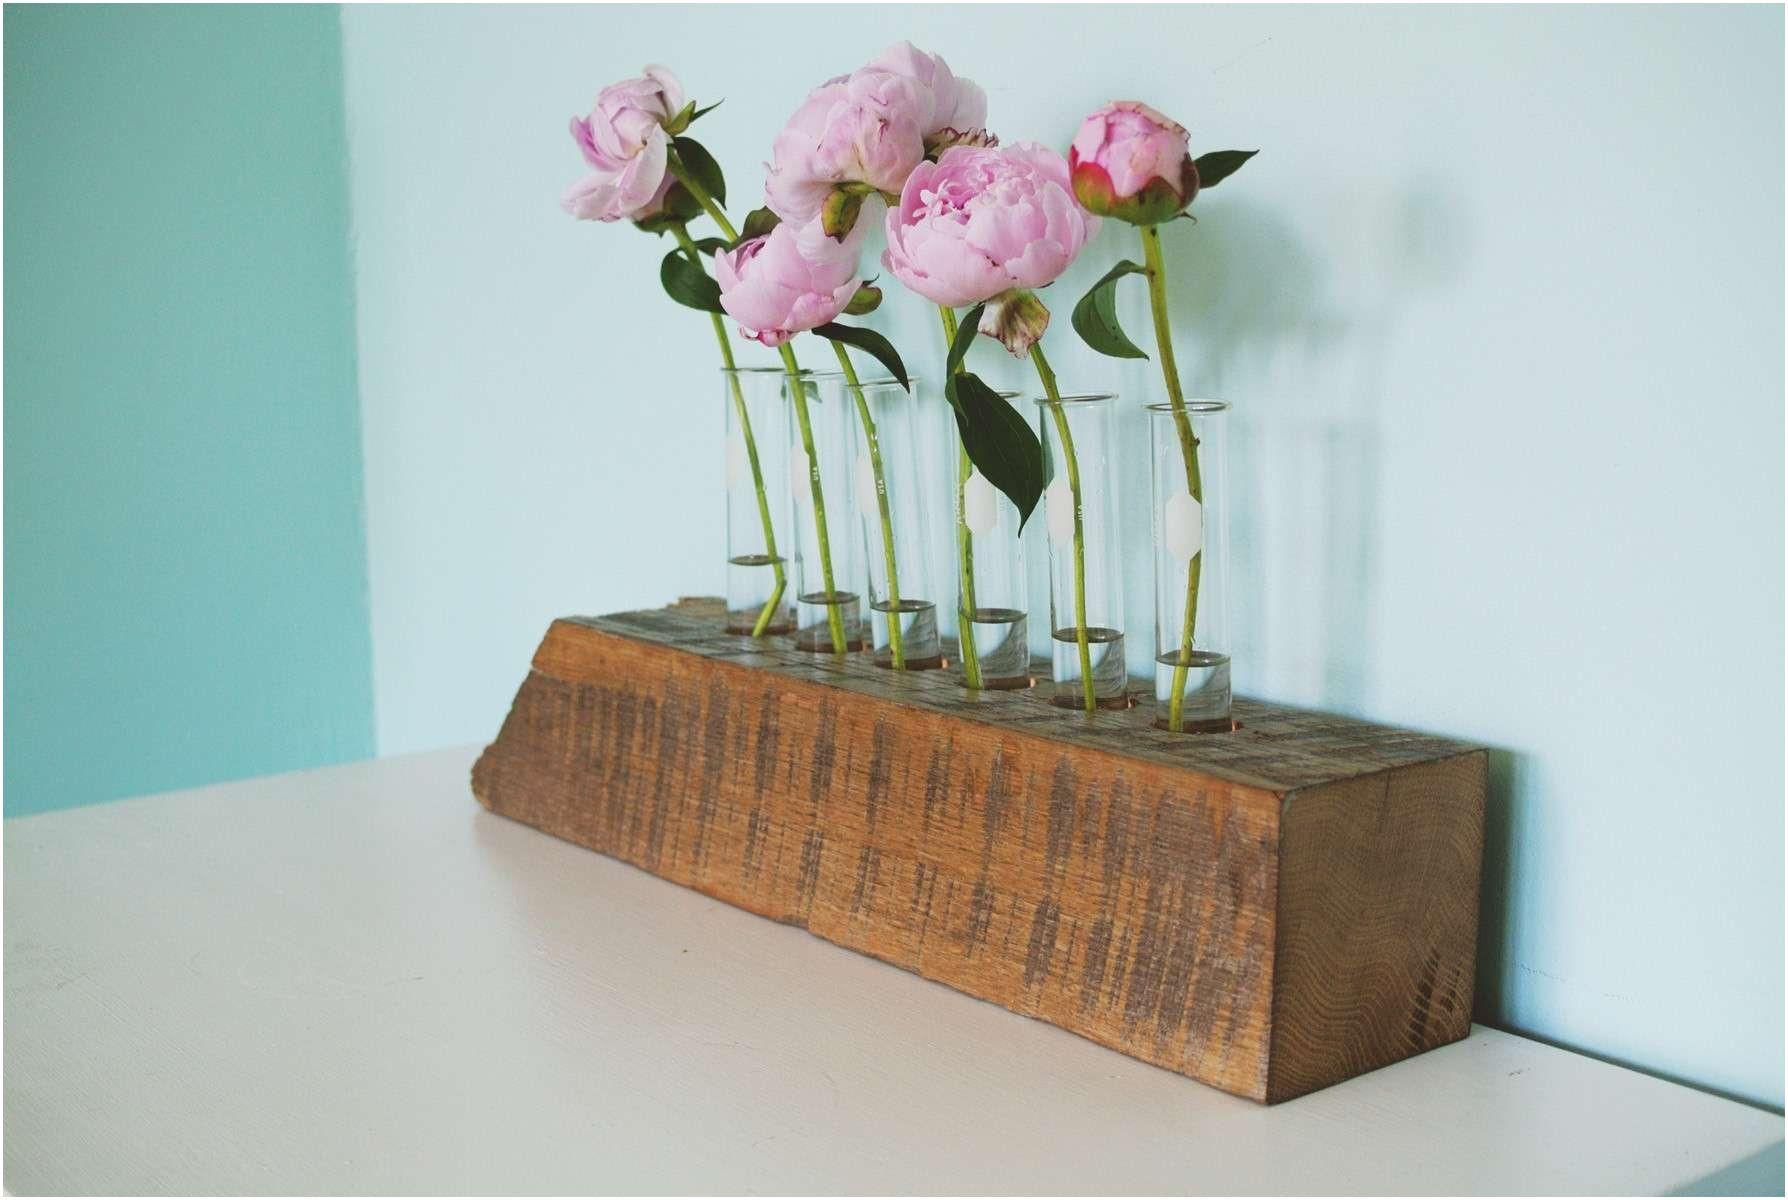 Single Rose Glass Vase Of Flower Arrangement In Vase Lovely Flower Arrangements Staggering for Flower Arrangement In Vase Lovely Flower Arrangements Staggering Vases Vase for E Flower Shaffa I 0d